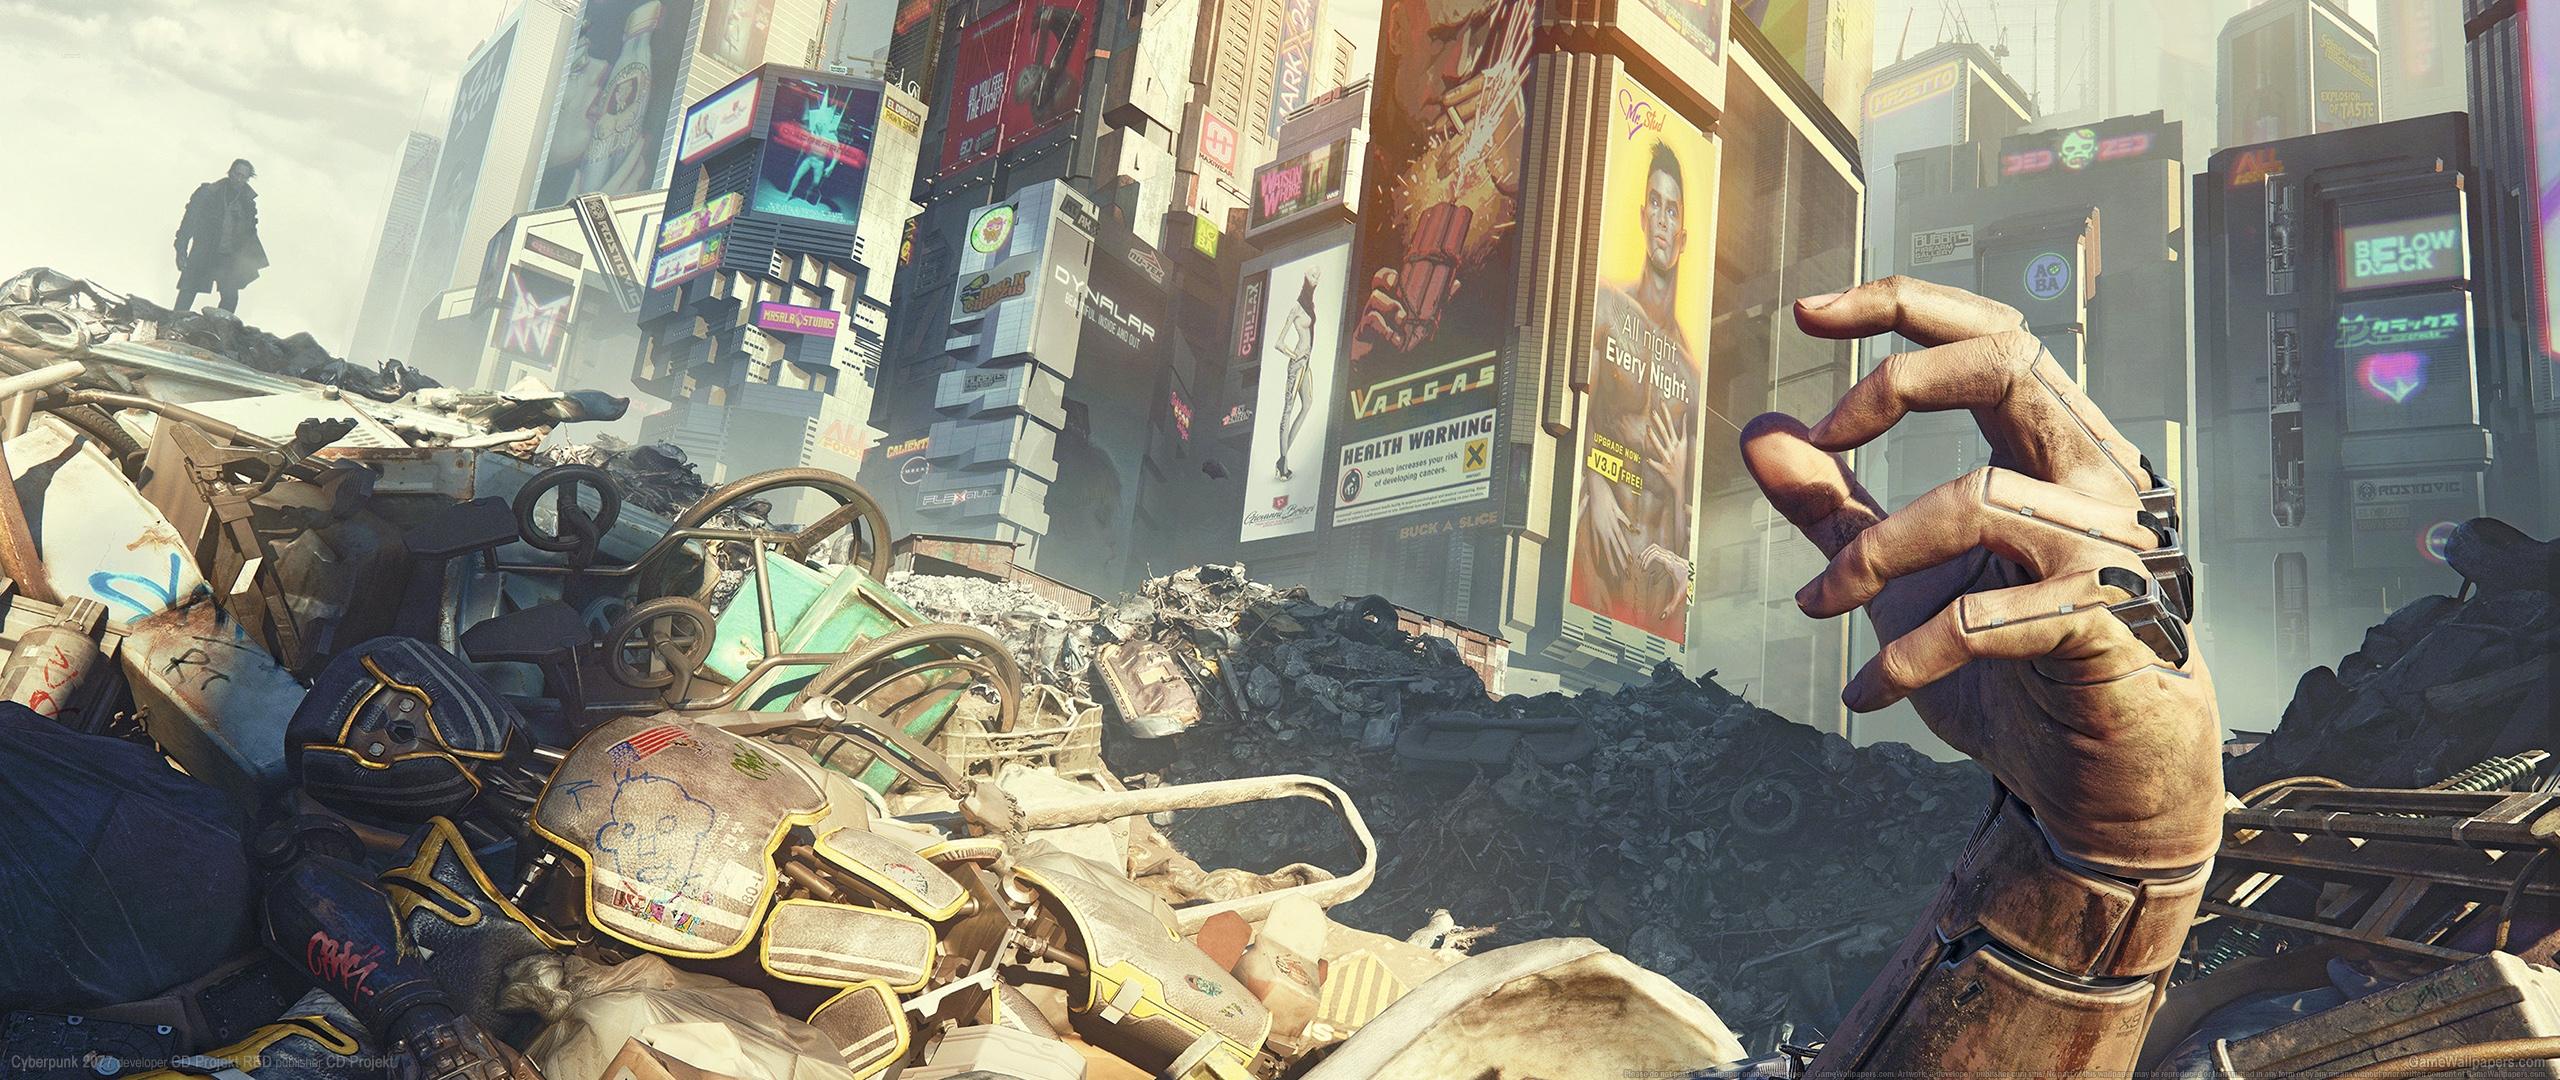 Cyberpunk 2077 2560x1080 fond d'écran 25